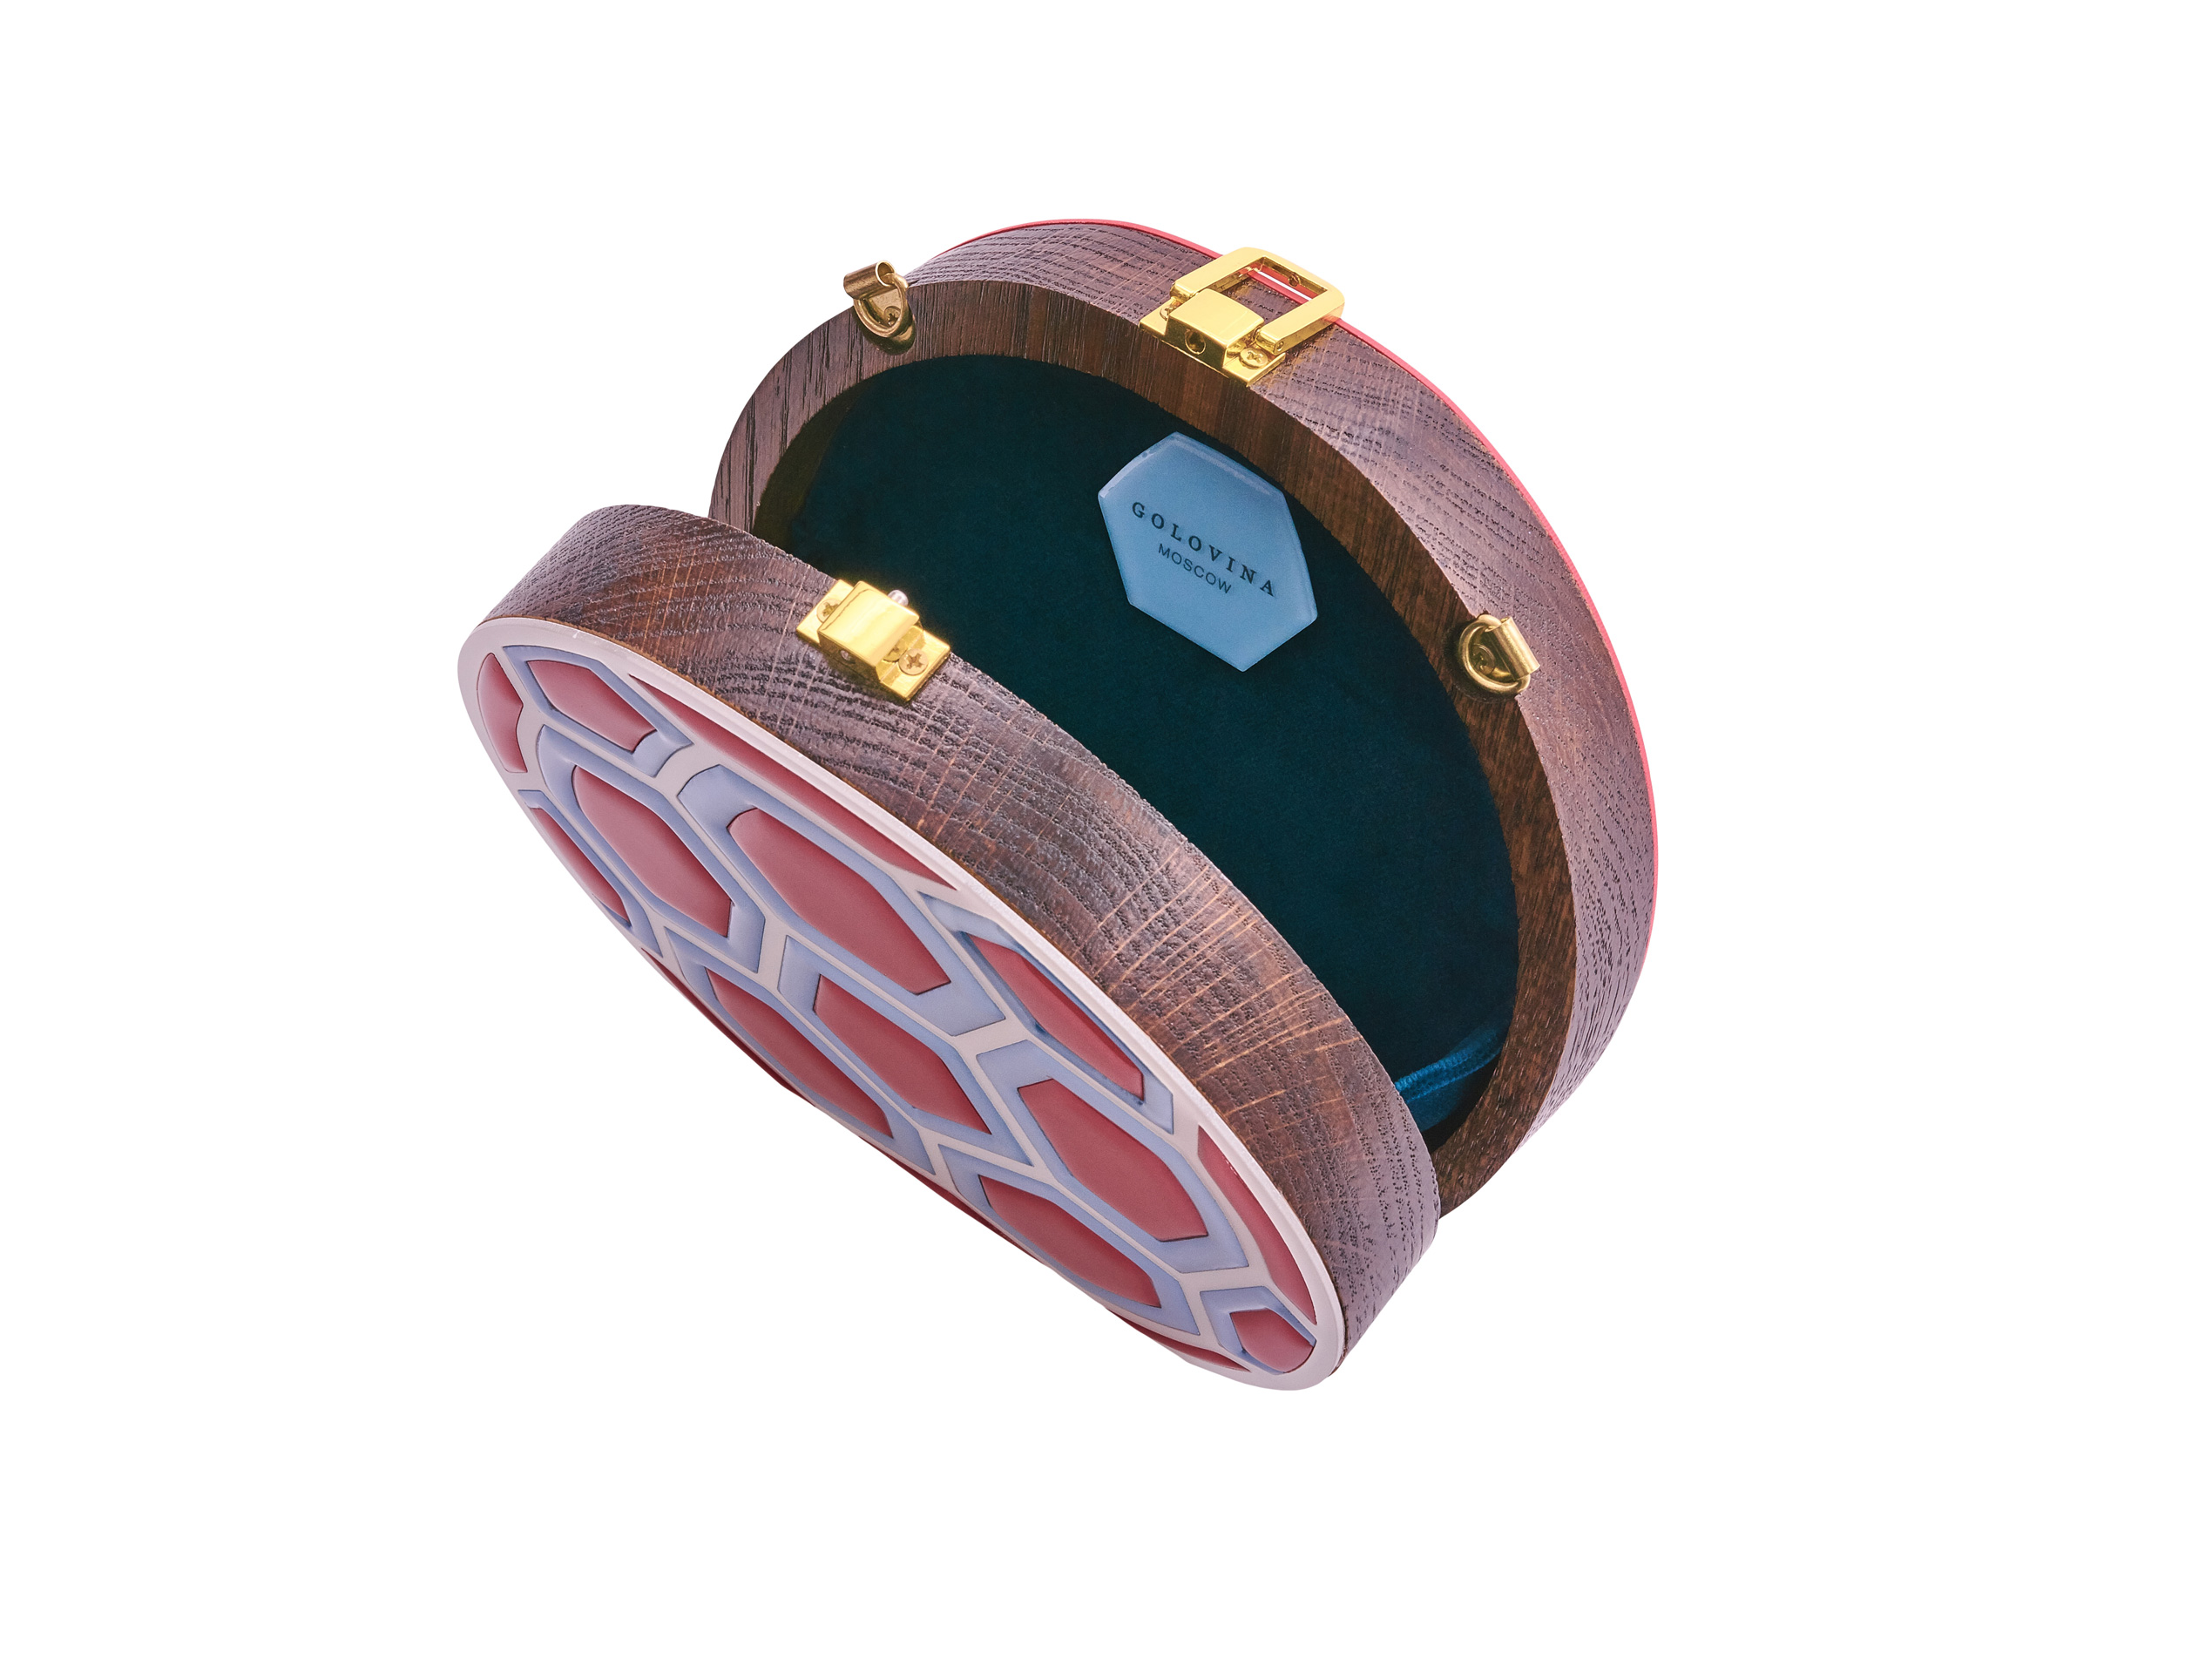 Golovina match ball clutch bag red and blue